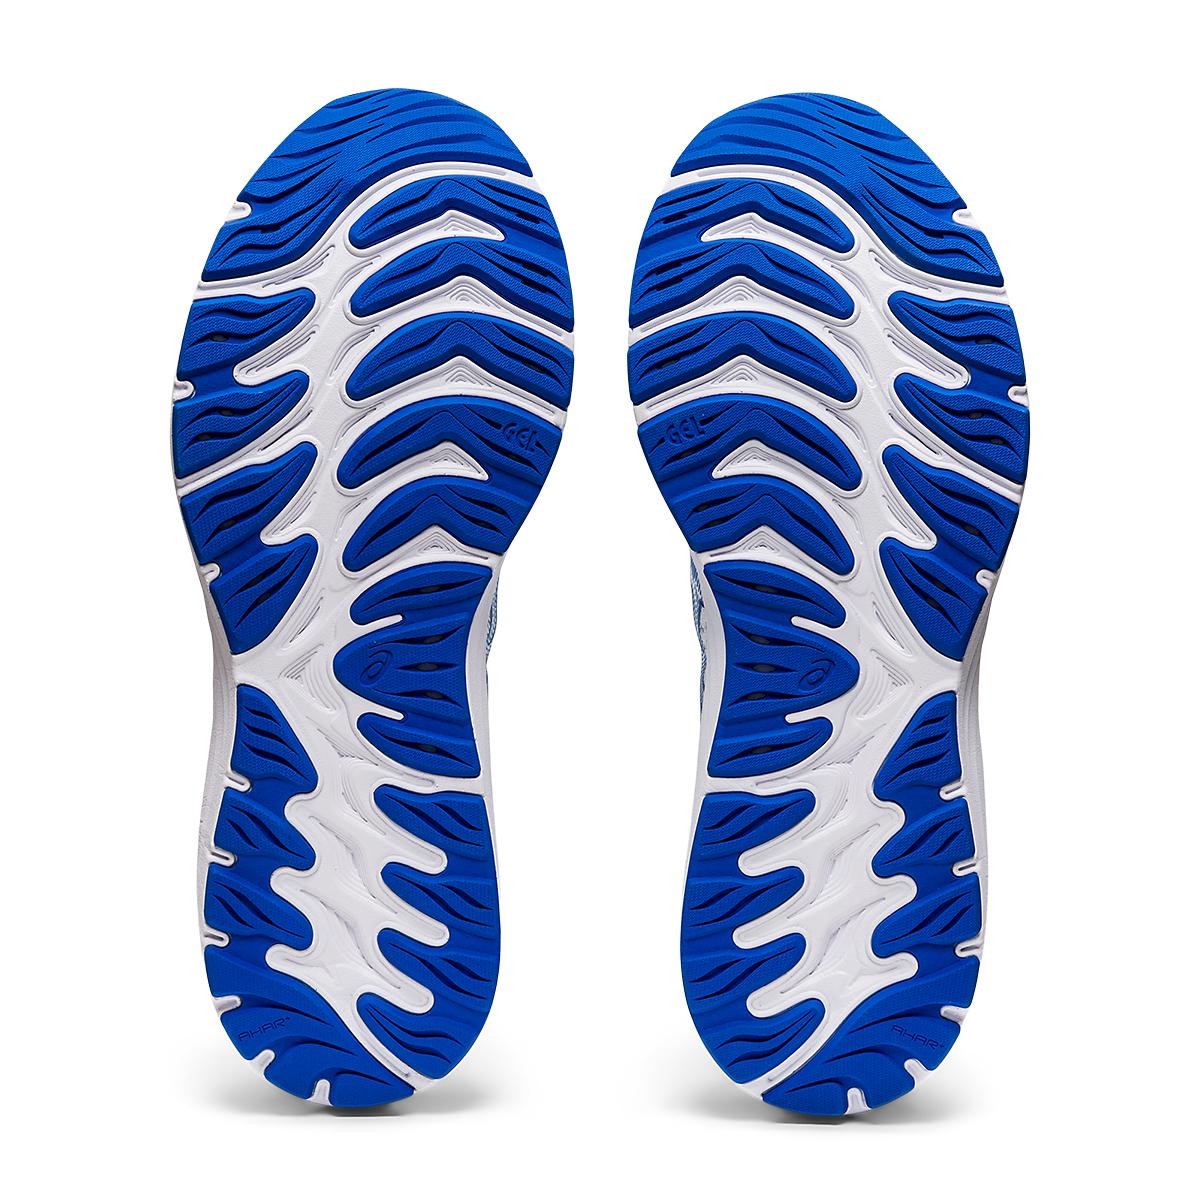 Men's Asics SMU Gel-Cumulus 23 Running Shoe - Color: White/Tuna Blue - Size: 6 - Width: Regular, White/Tuna Blue, large, image 7